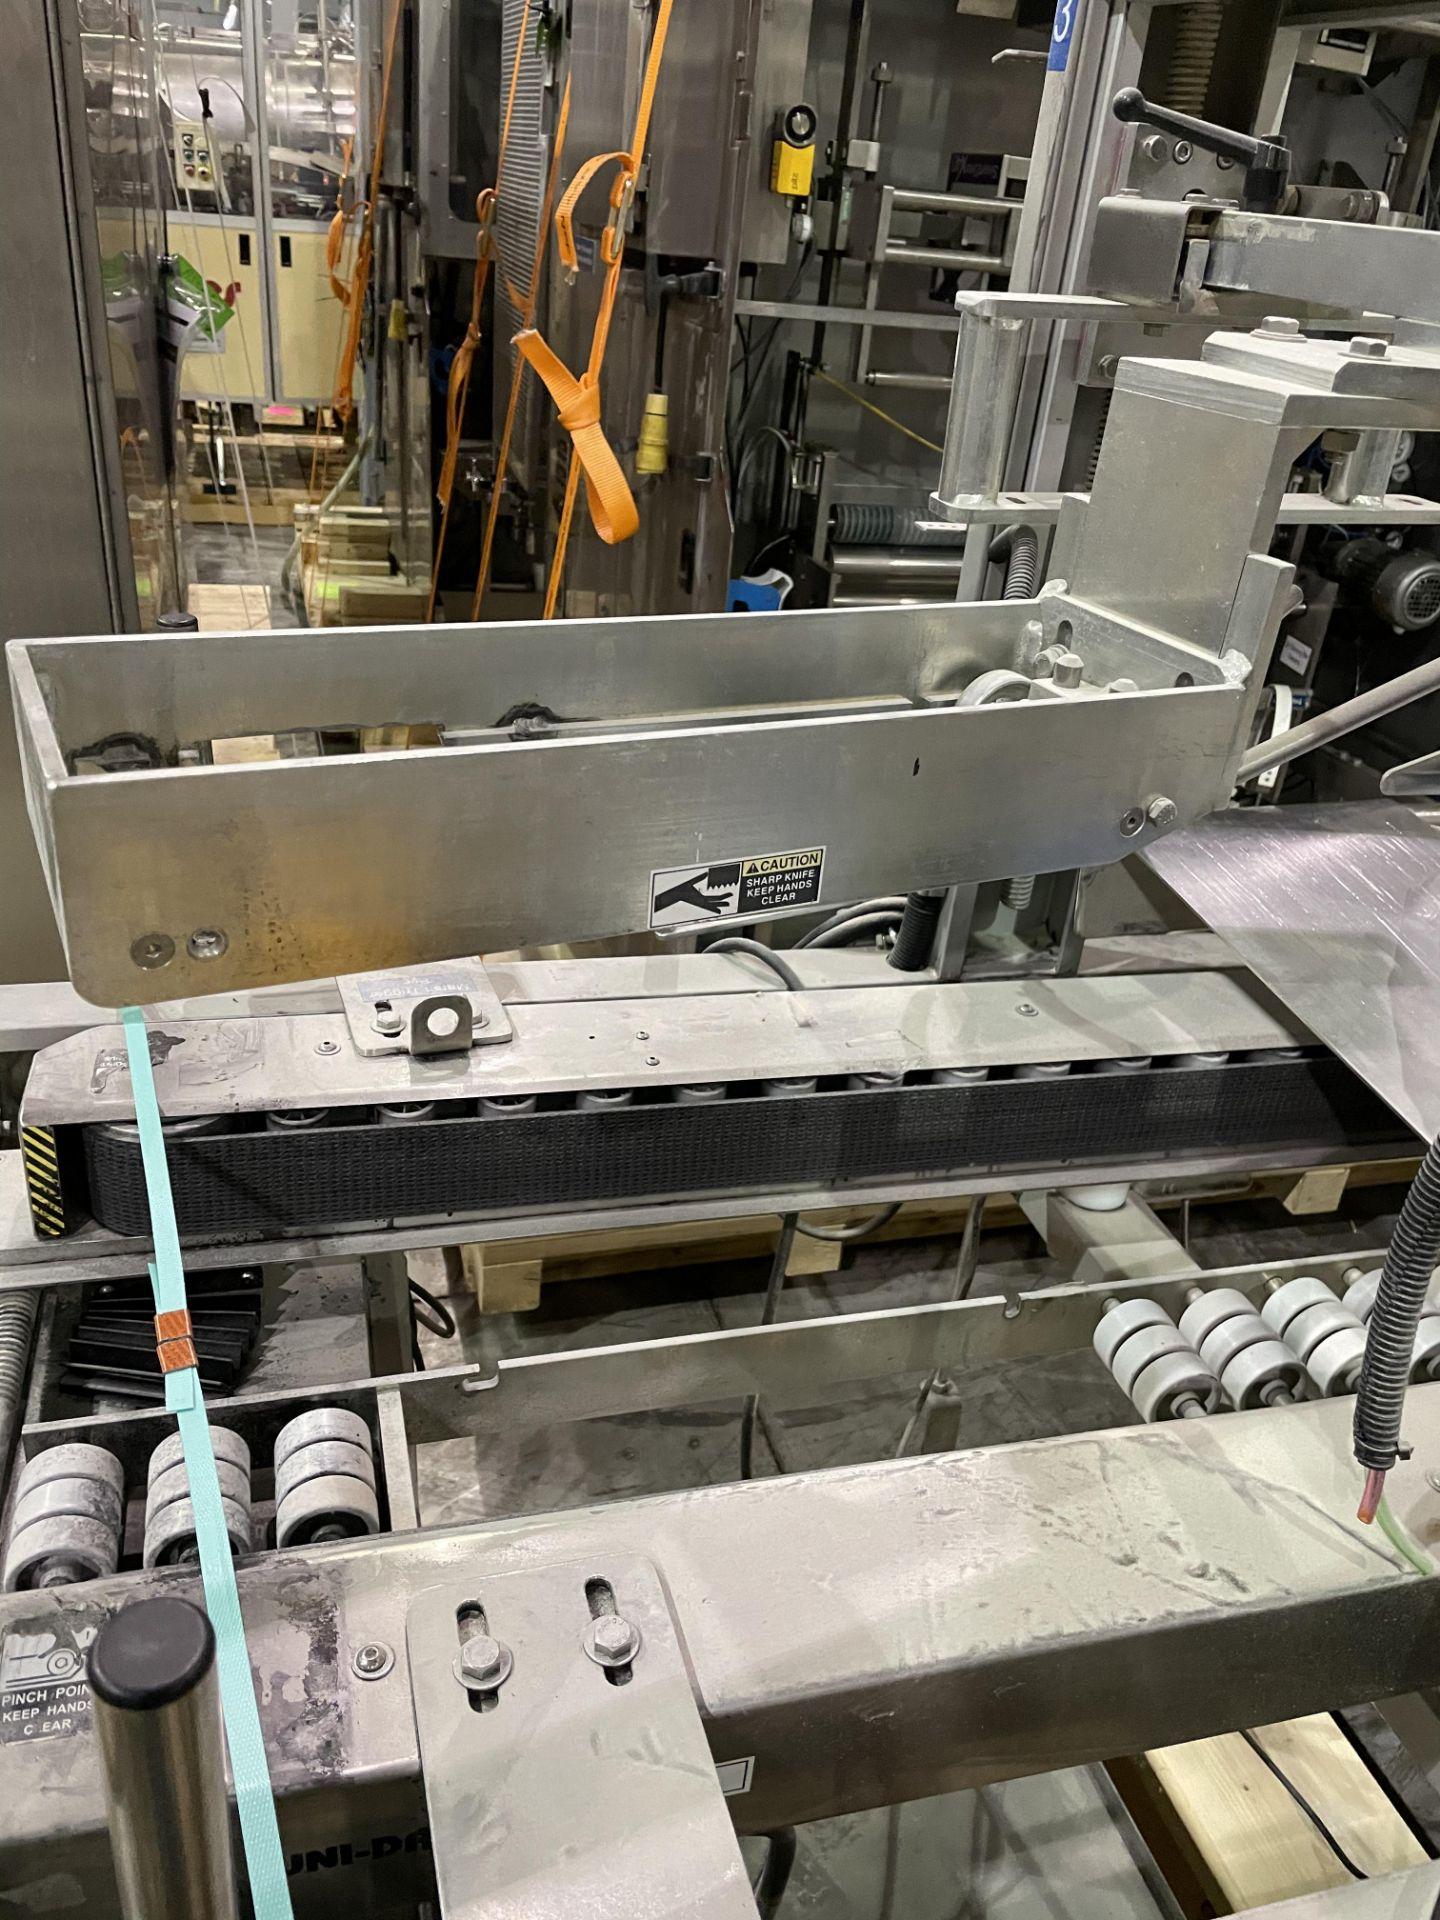 Belcor 252 Taper and Bel 505 Snap Folder and Marsh Patrion Printer NO TAPE HEADS Loading/Rigging Fe - Image 2 of 4